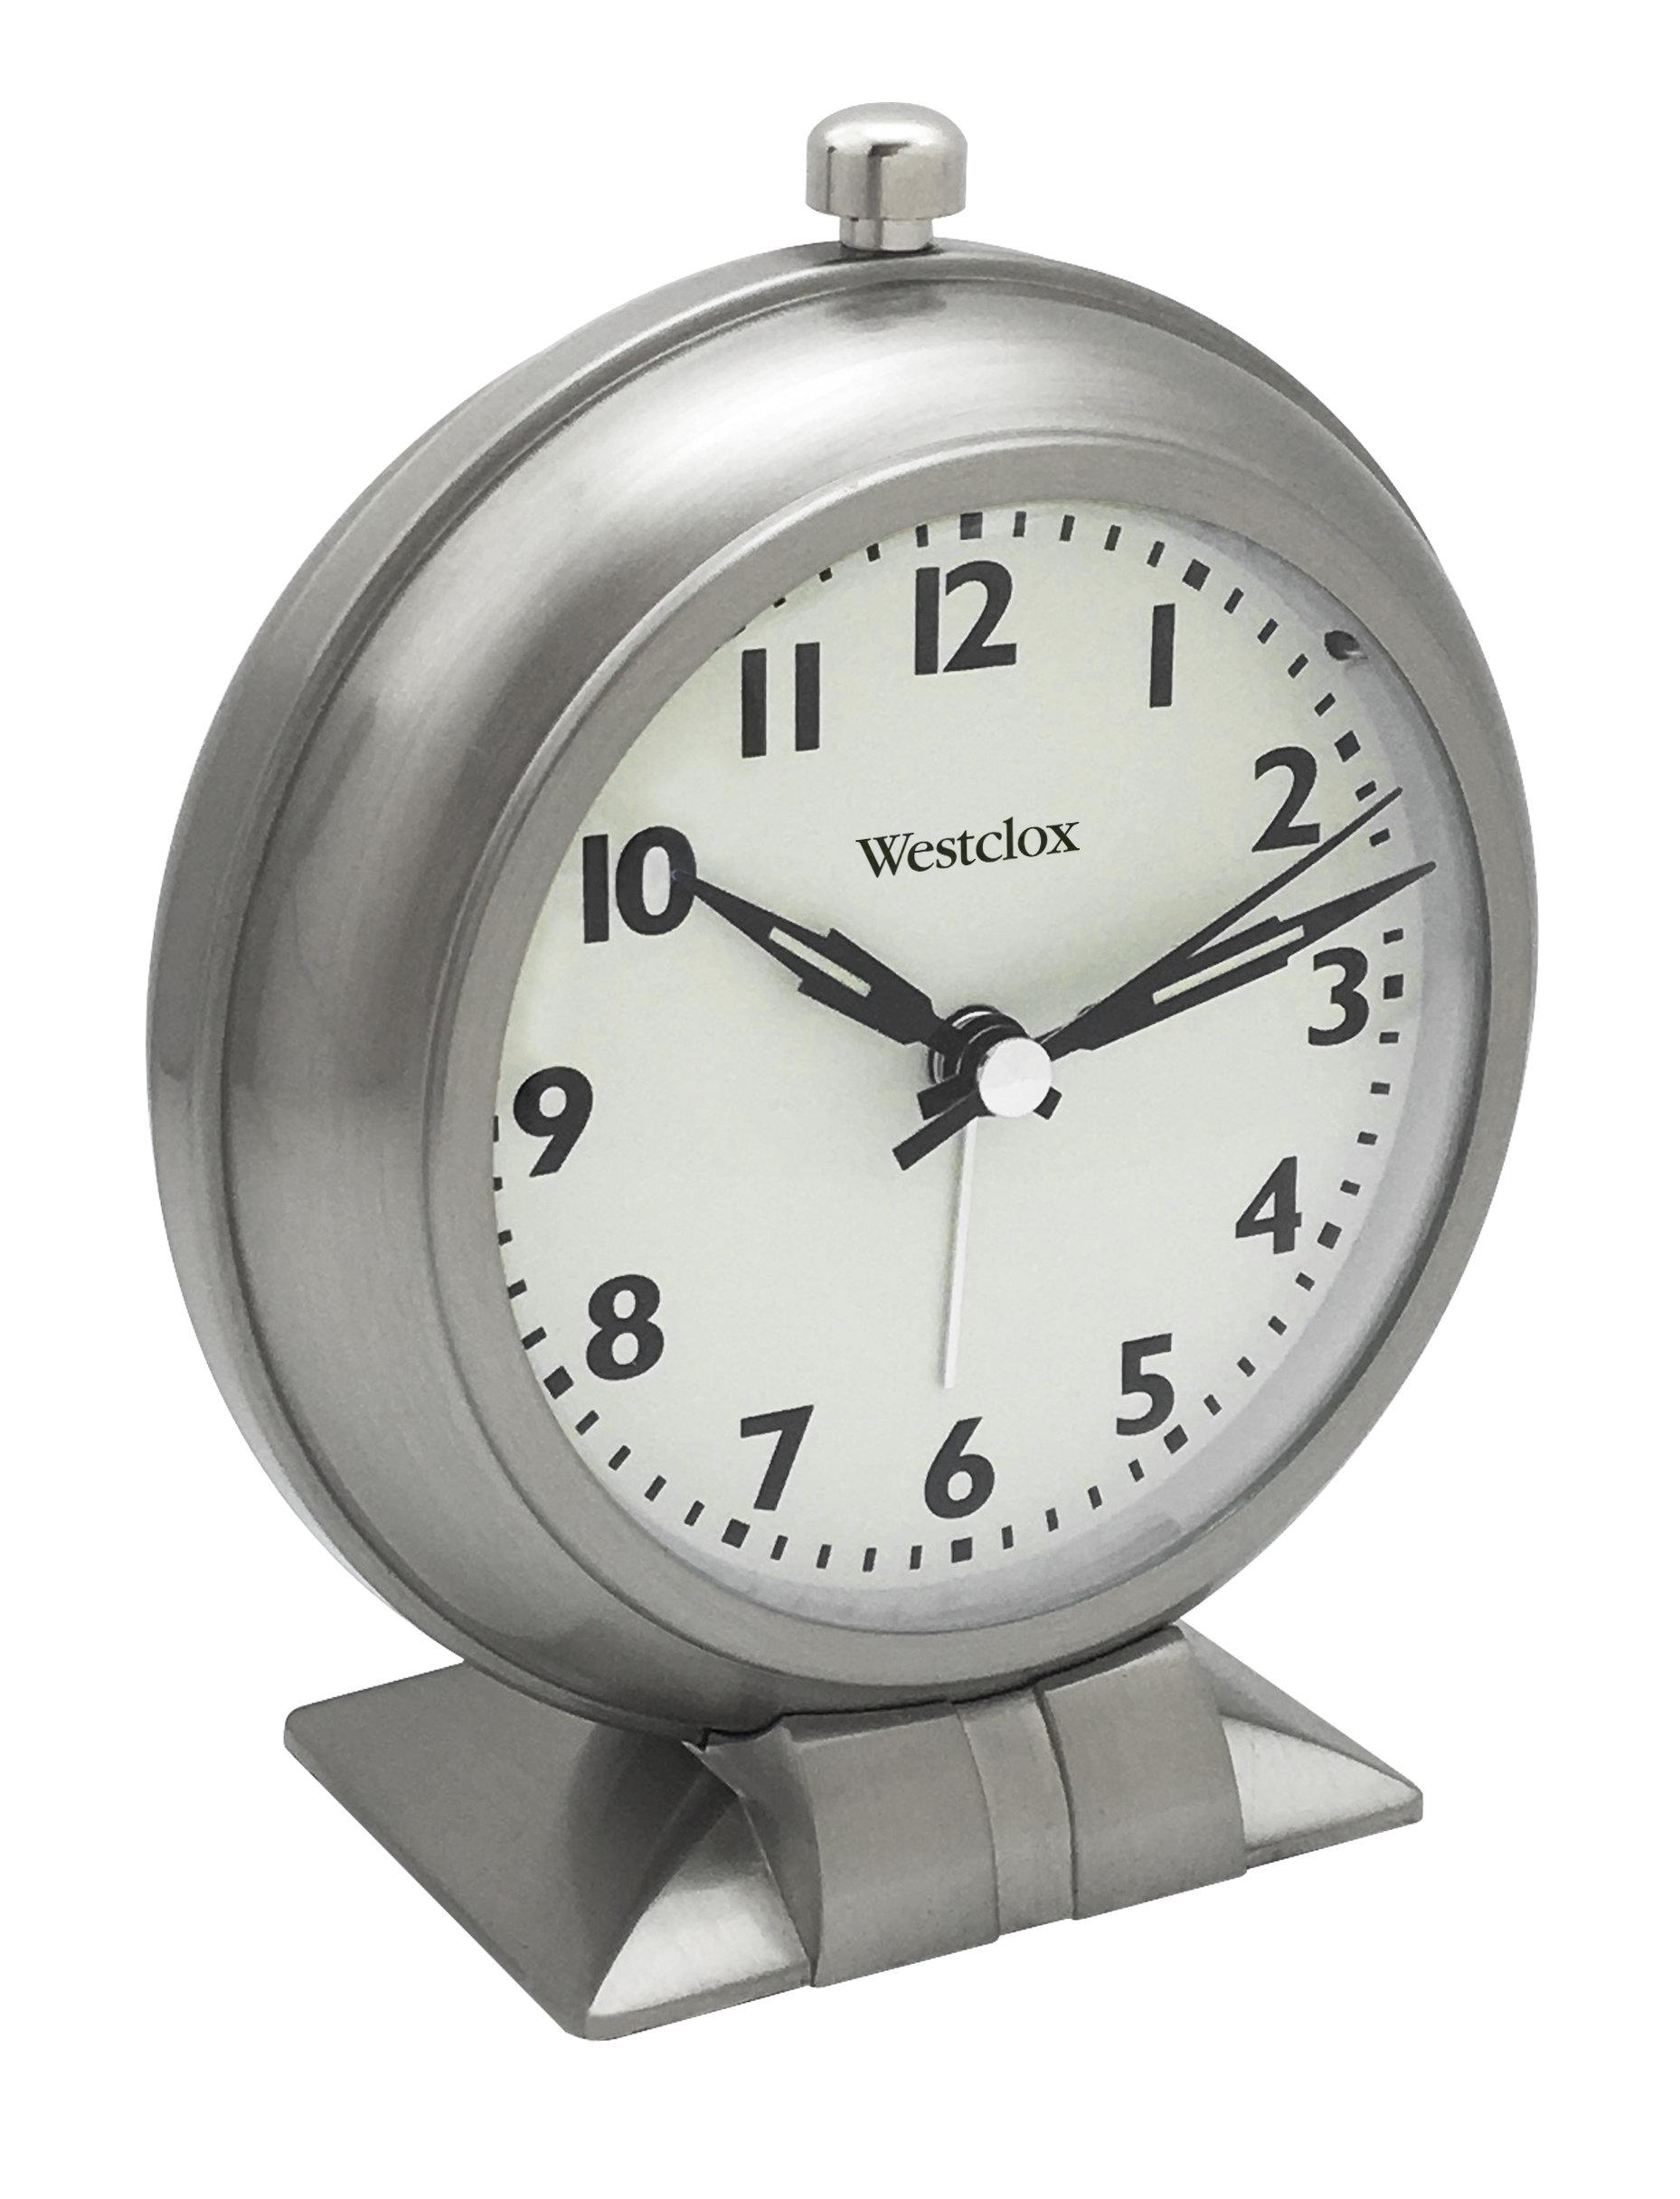 Westclox Classic Alarm Clock Full Size 47602 47602